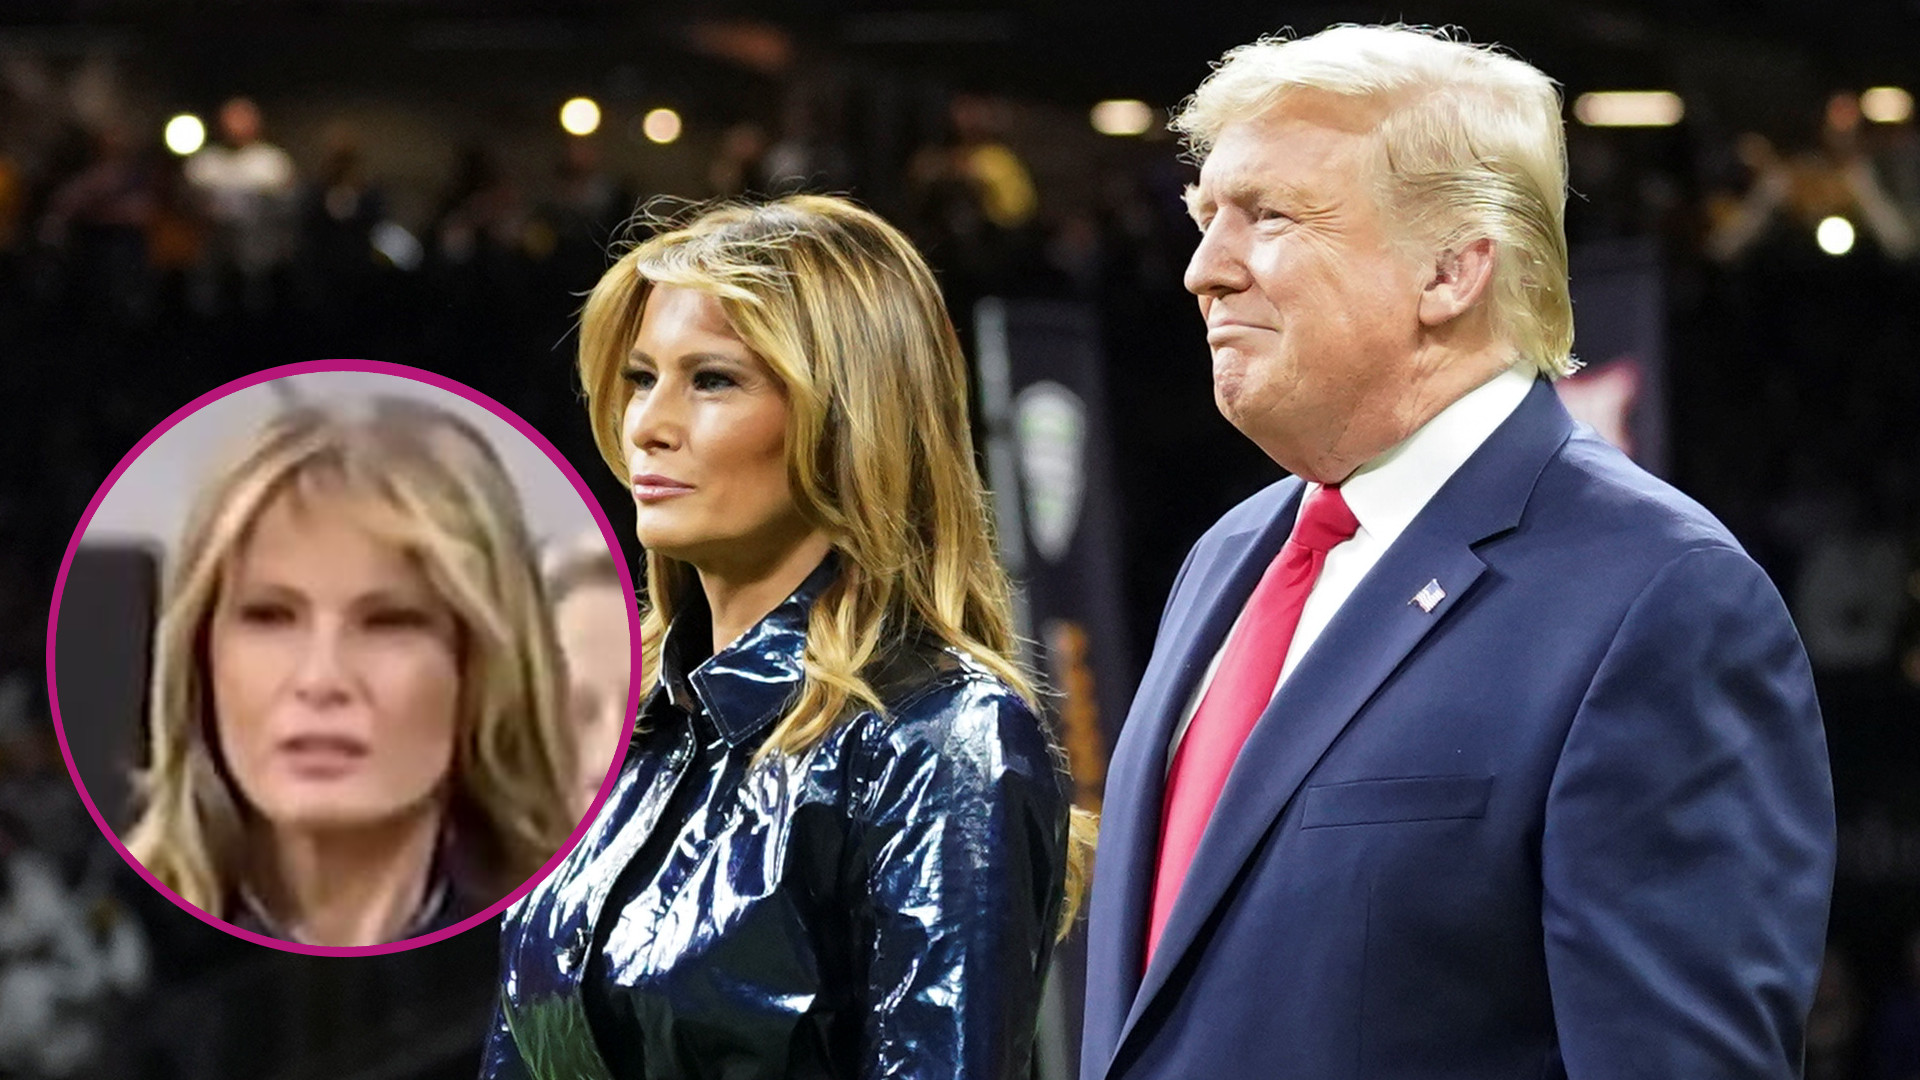 Internet HUCZY dziś na temat tego GESTU Melanii Trump względem Donalda